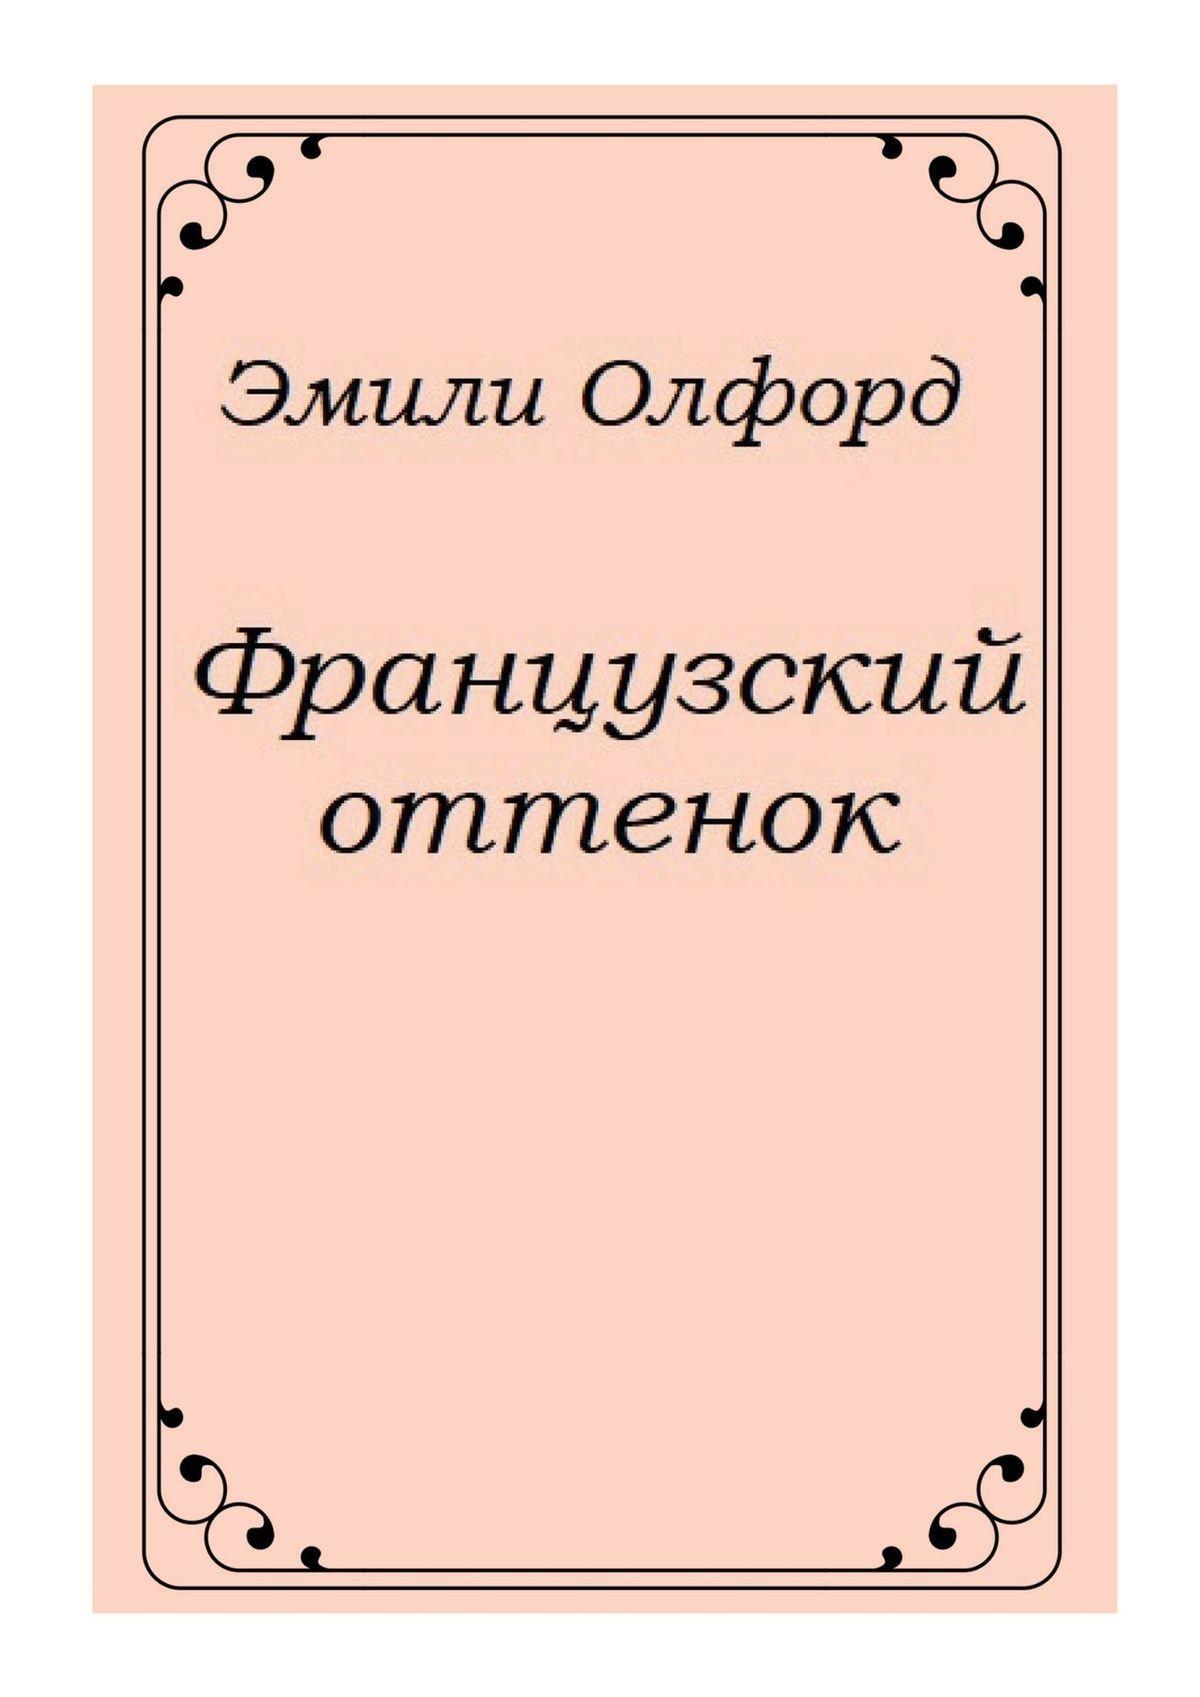 Эмили Олфорд - Французский оттенок